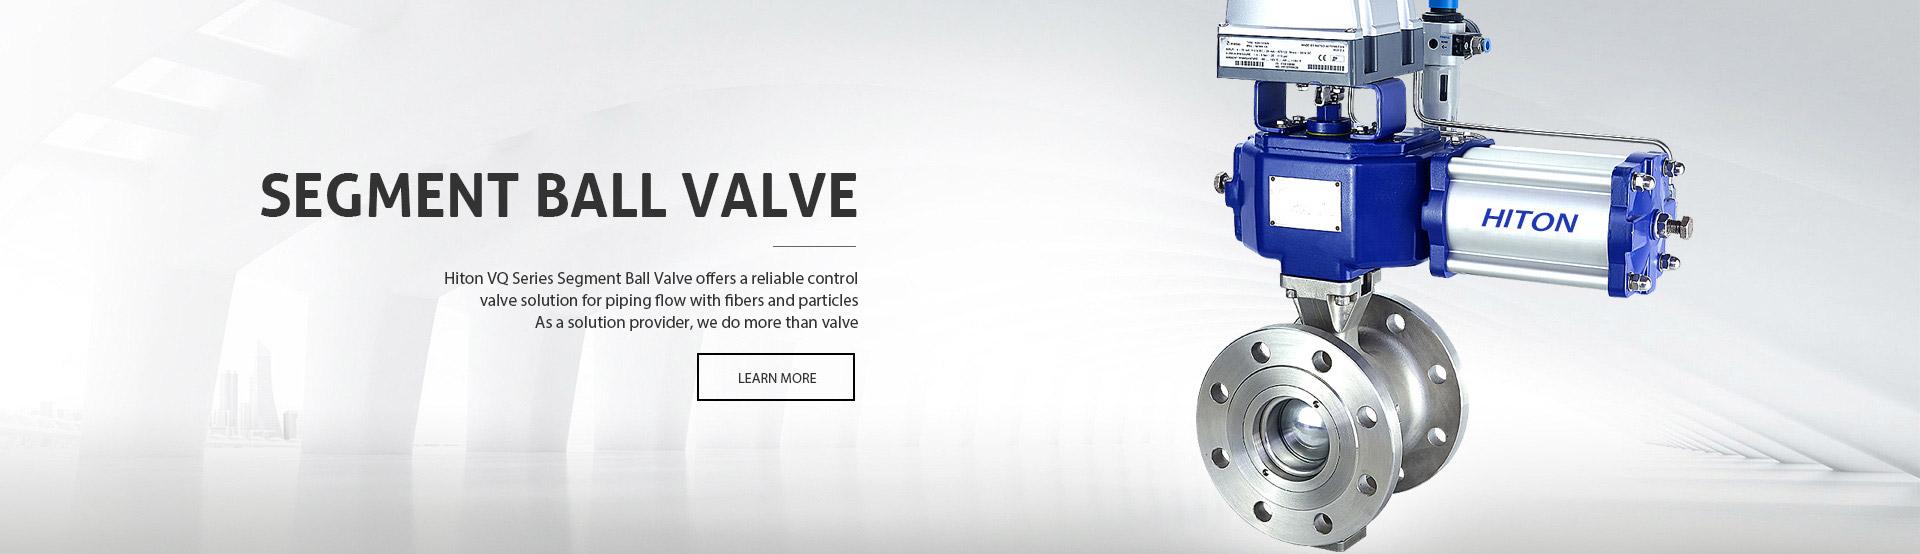 Segment Ball Valve | Knife Gate Valve | Hiton Special Valve